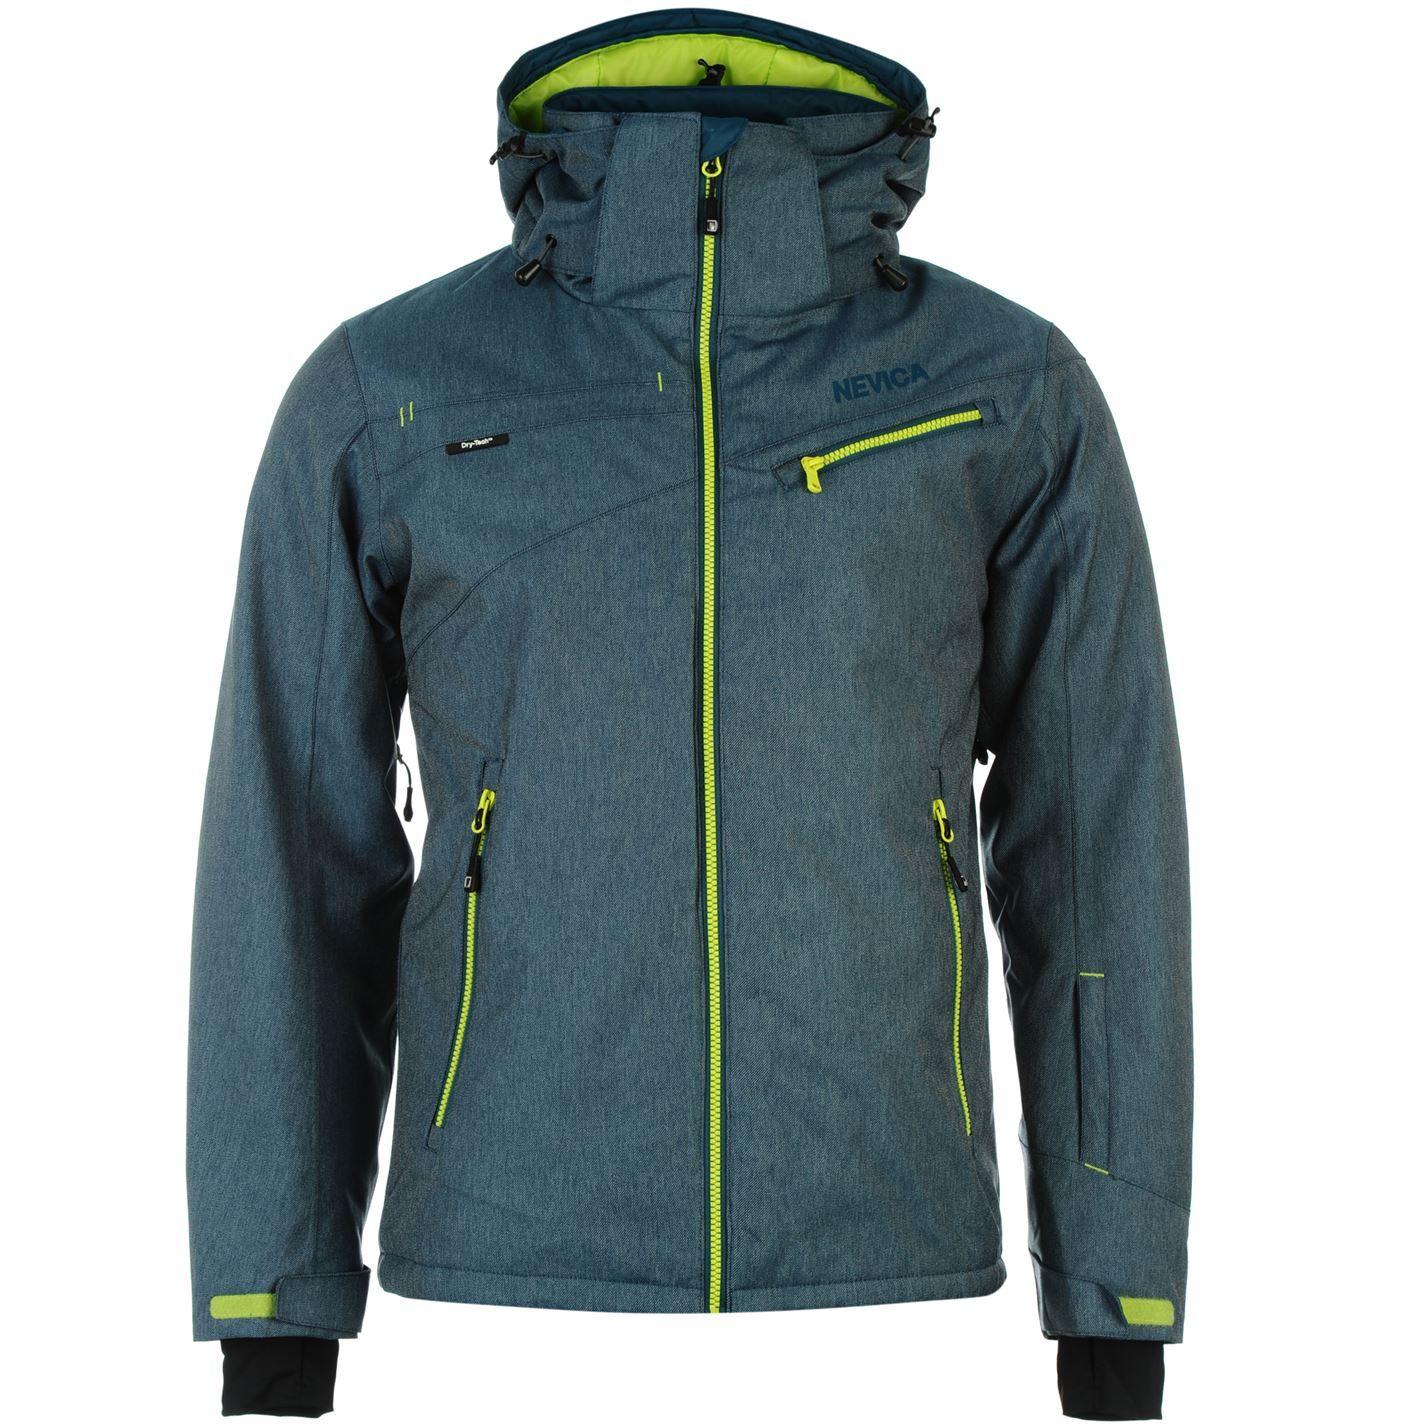 Nevica | Nevica Emilien Jacket Mens | Mens Ski Jackets | Riietus ...